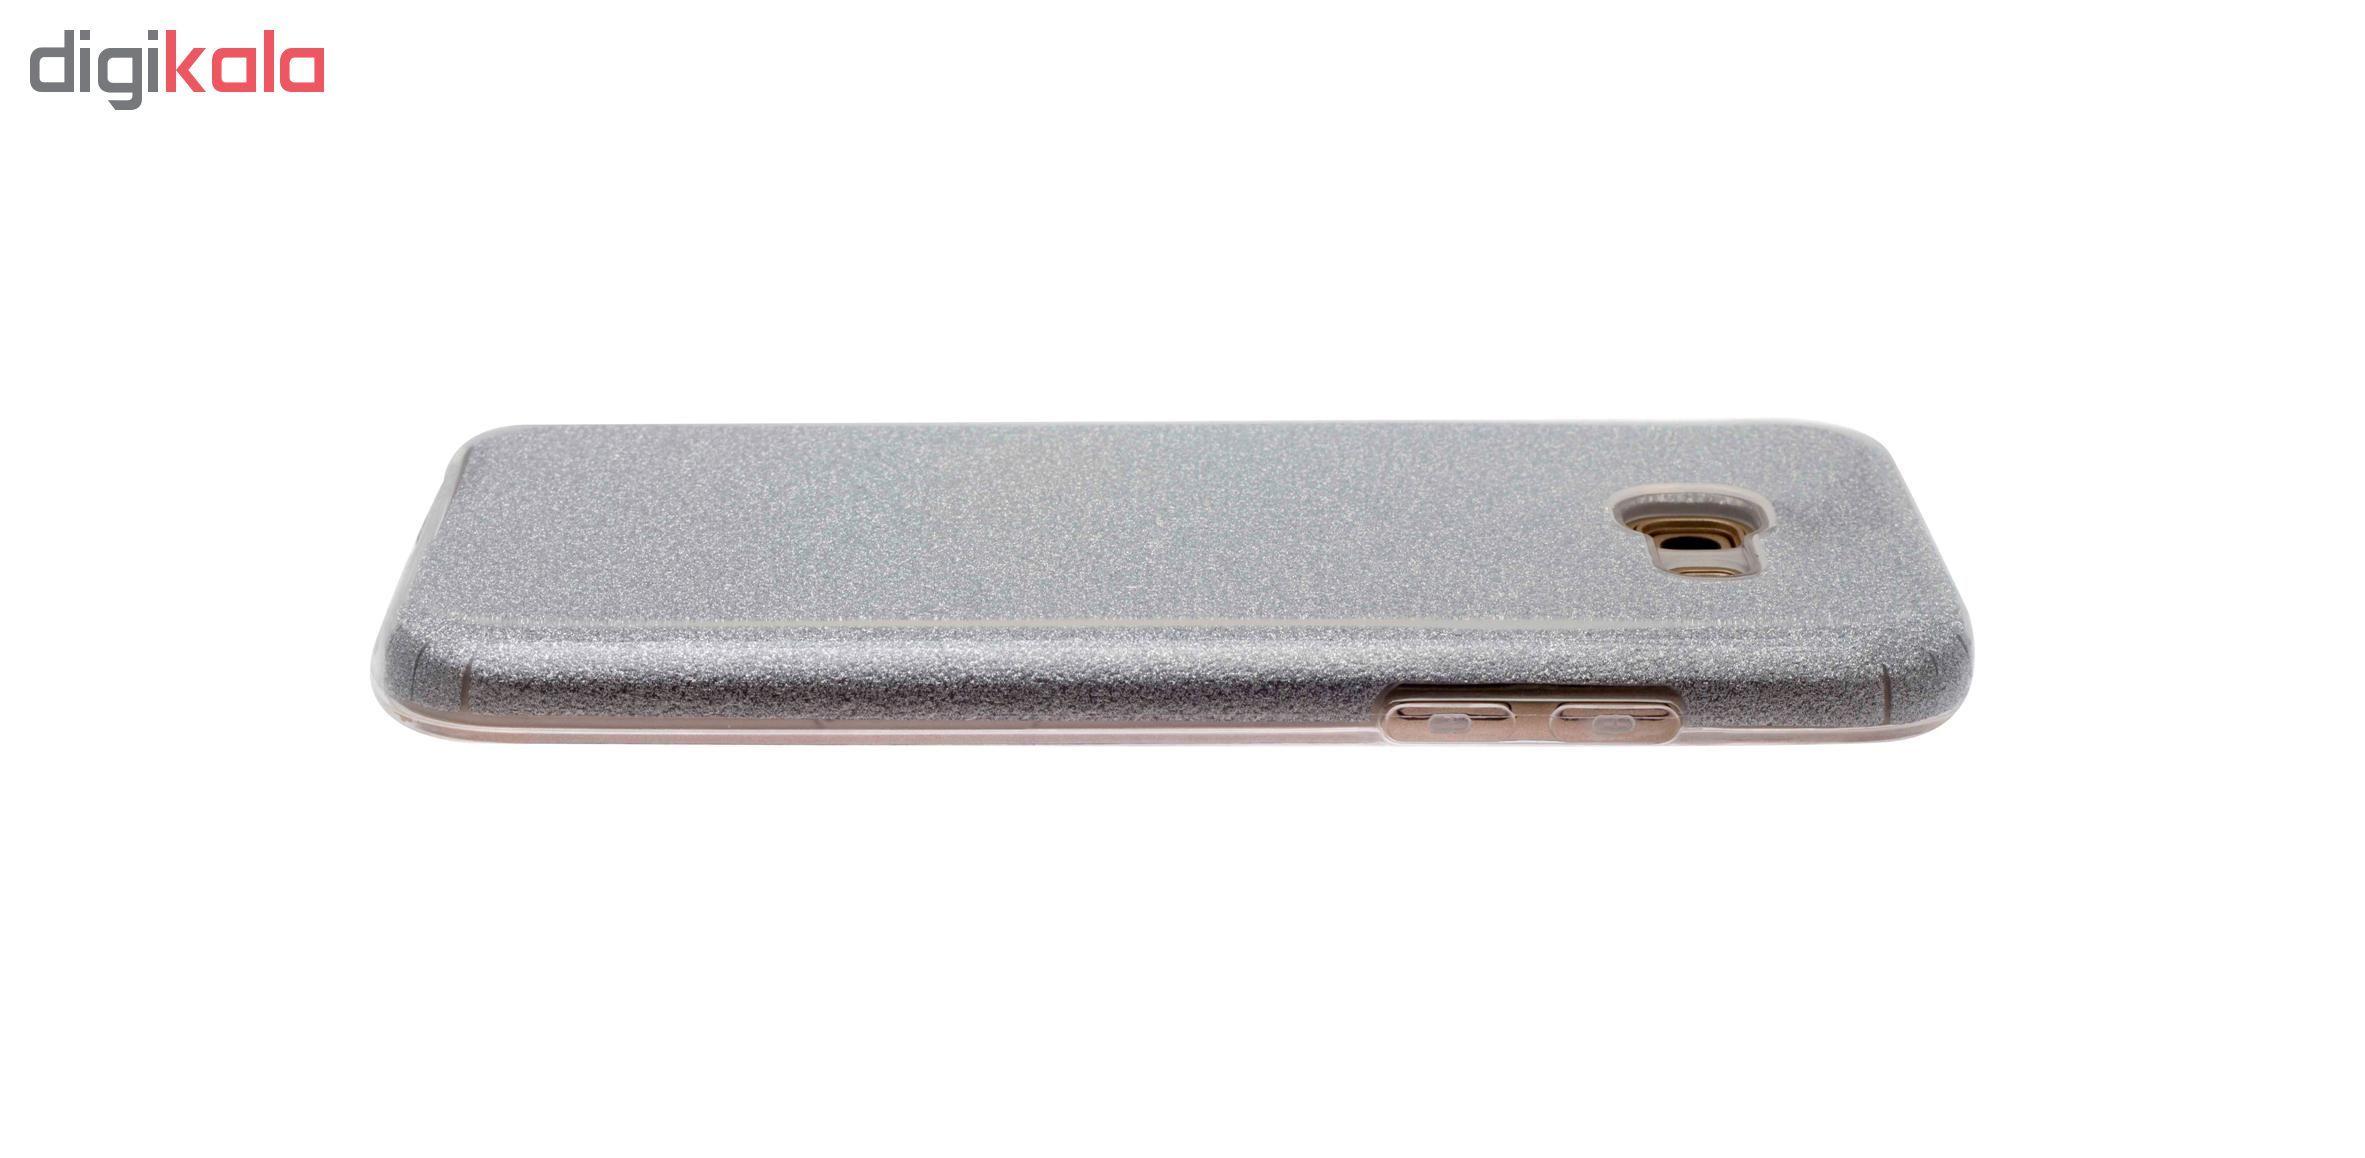 کاور مدل CORONA طرح اکلیلی مناسب برای گوشی سامسونگ گلکسی A5 2017 / A520 main 1 8